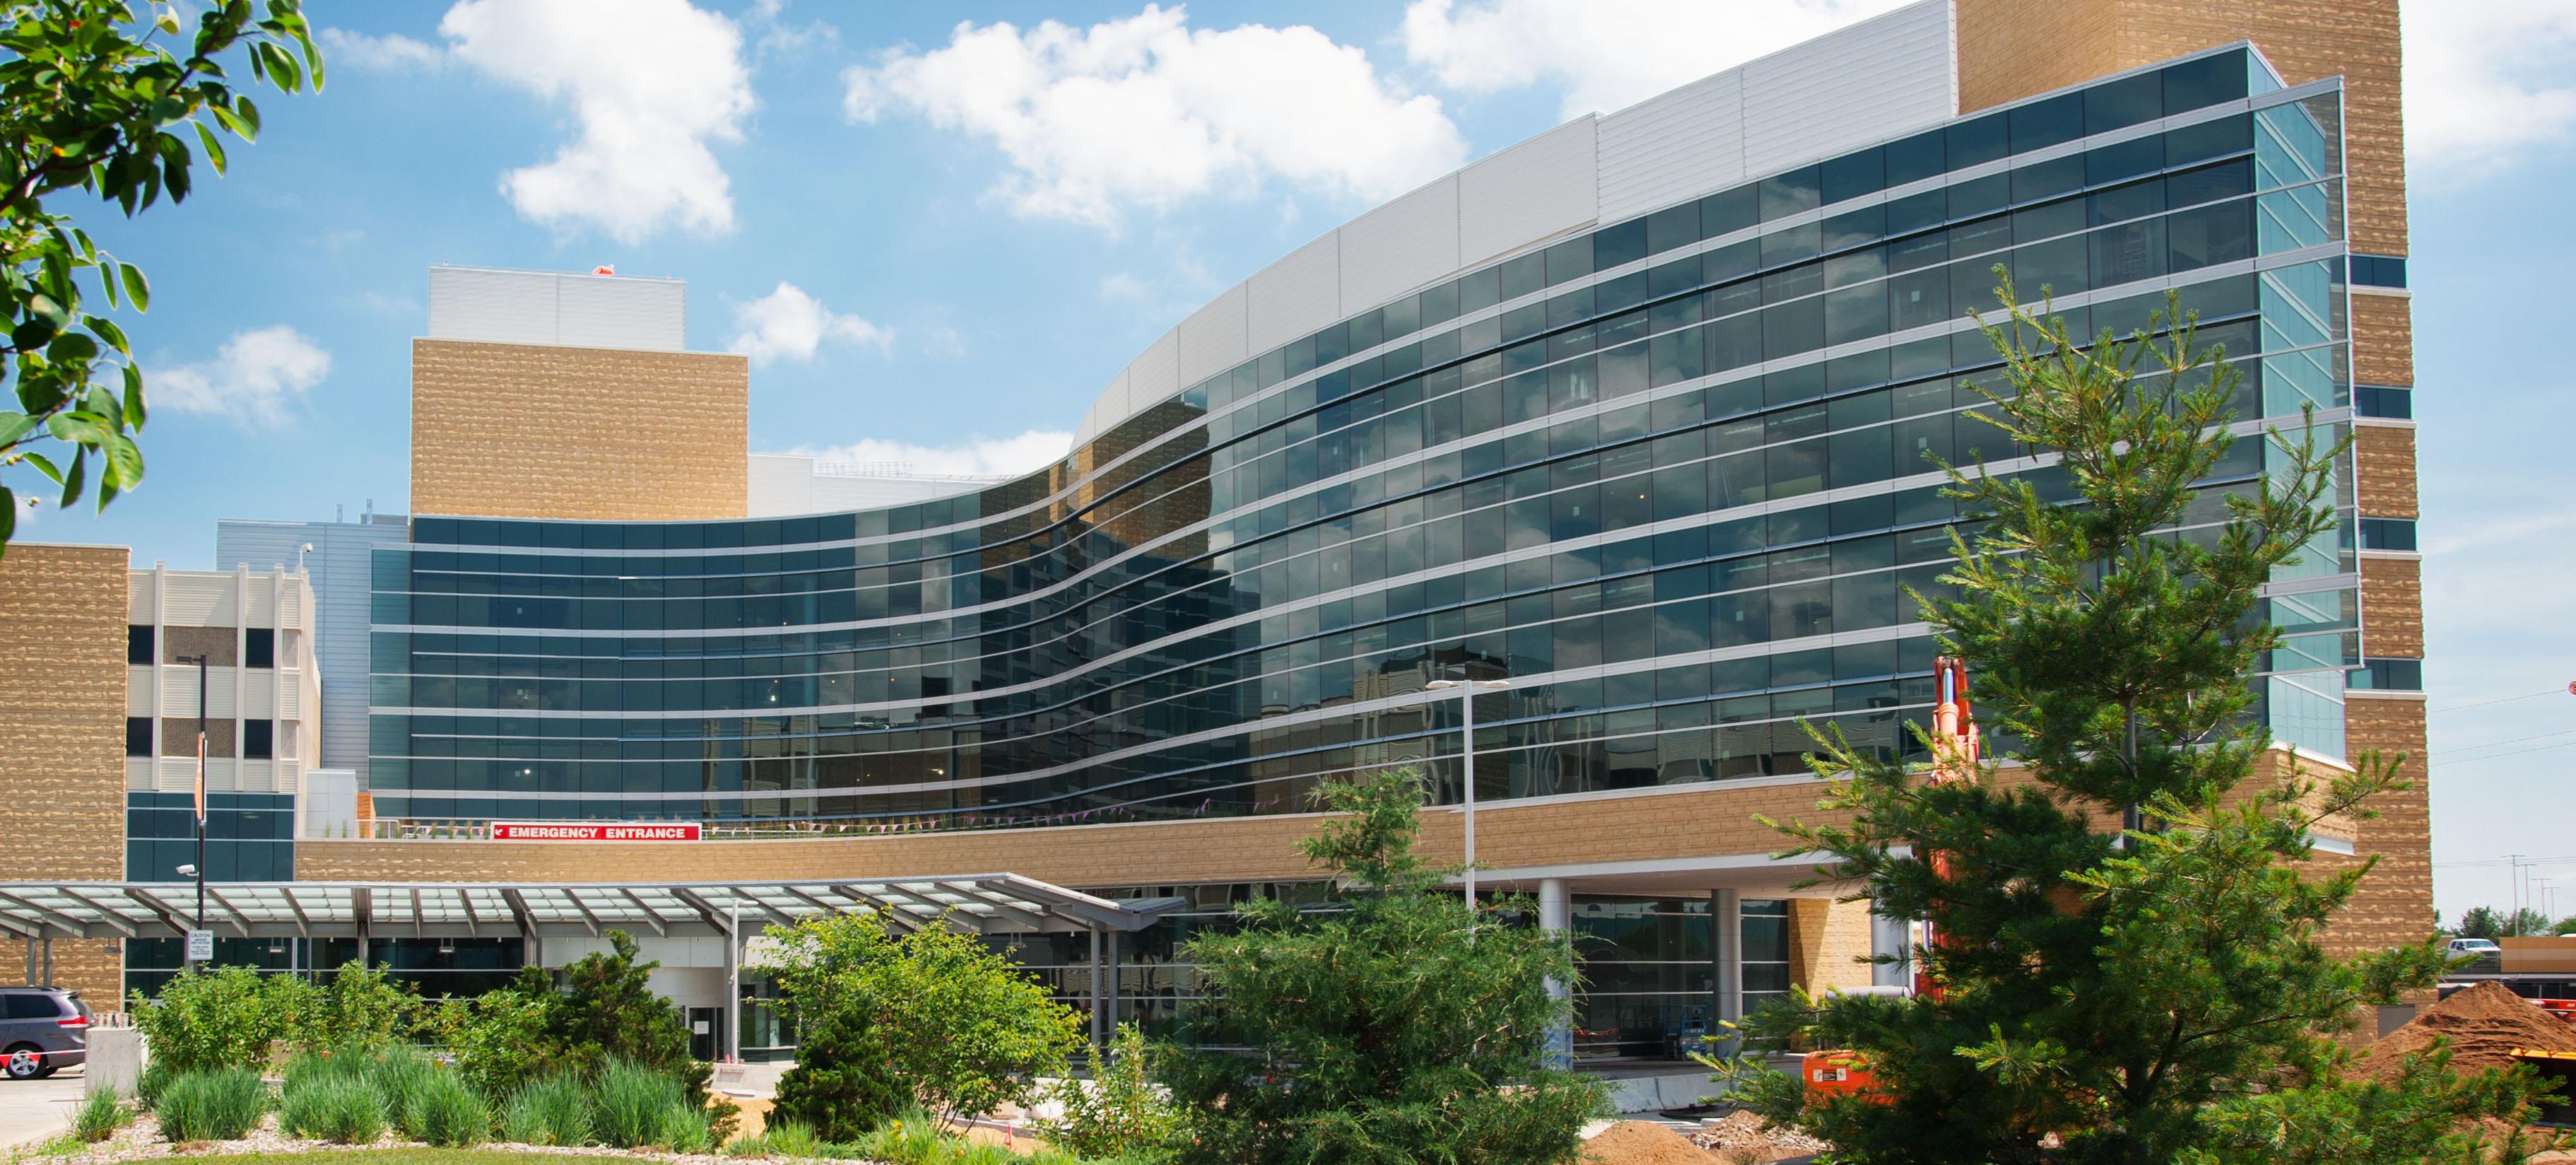 HealthSpaces Gundersen Health System